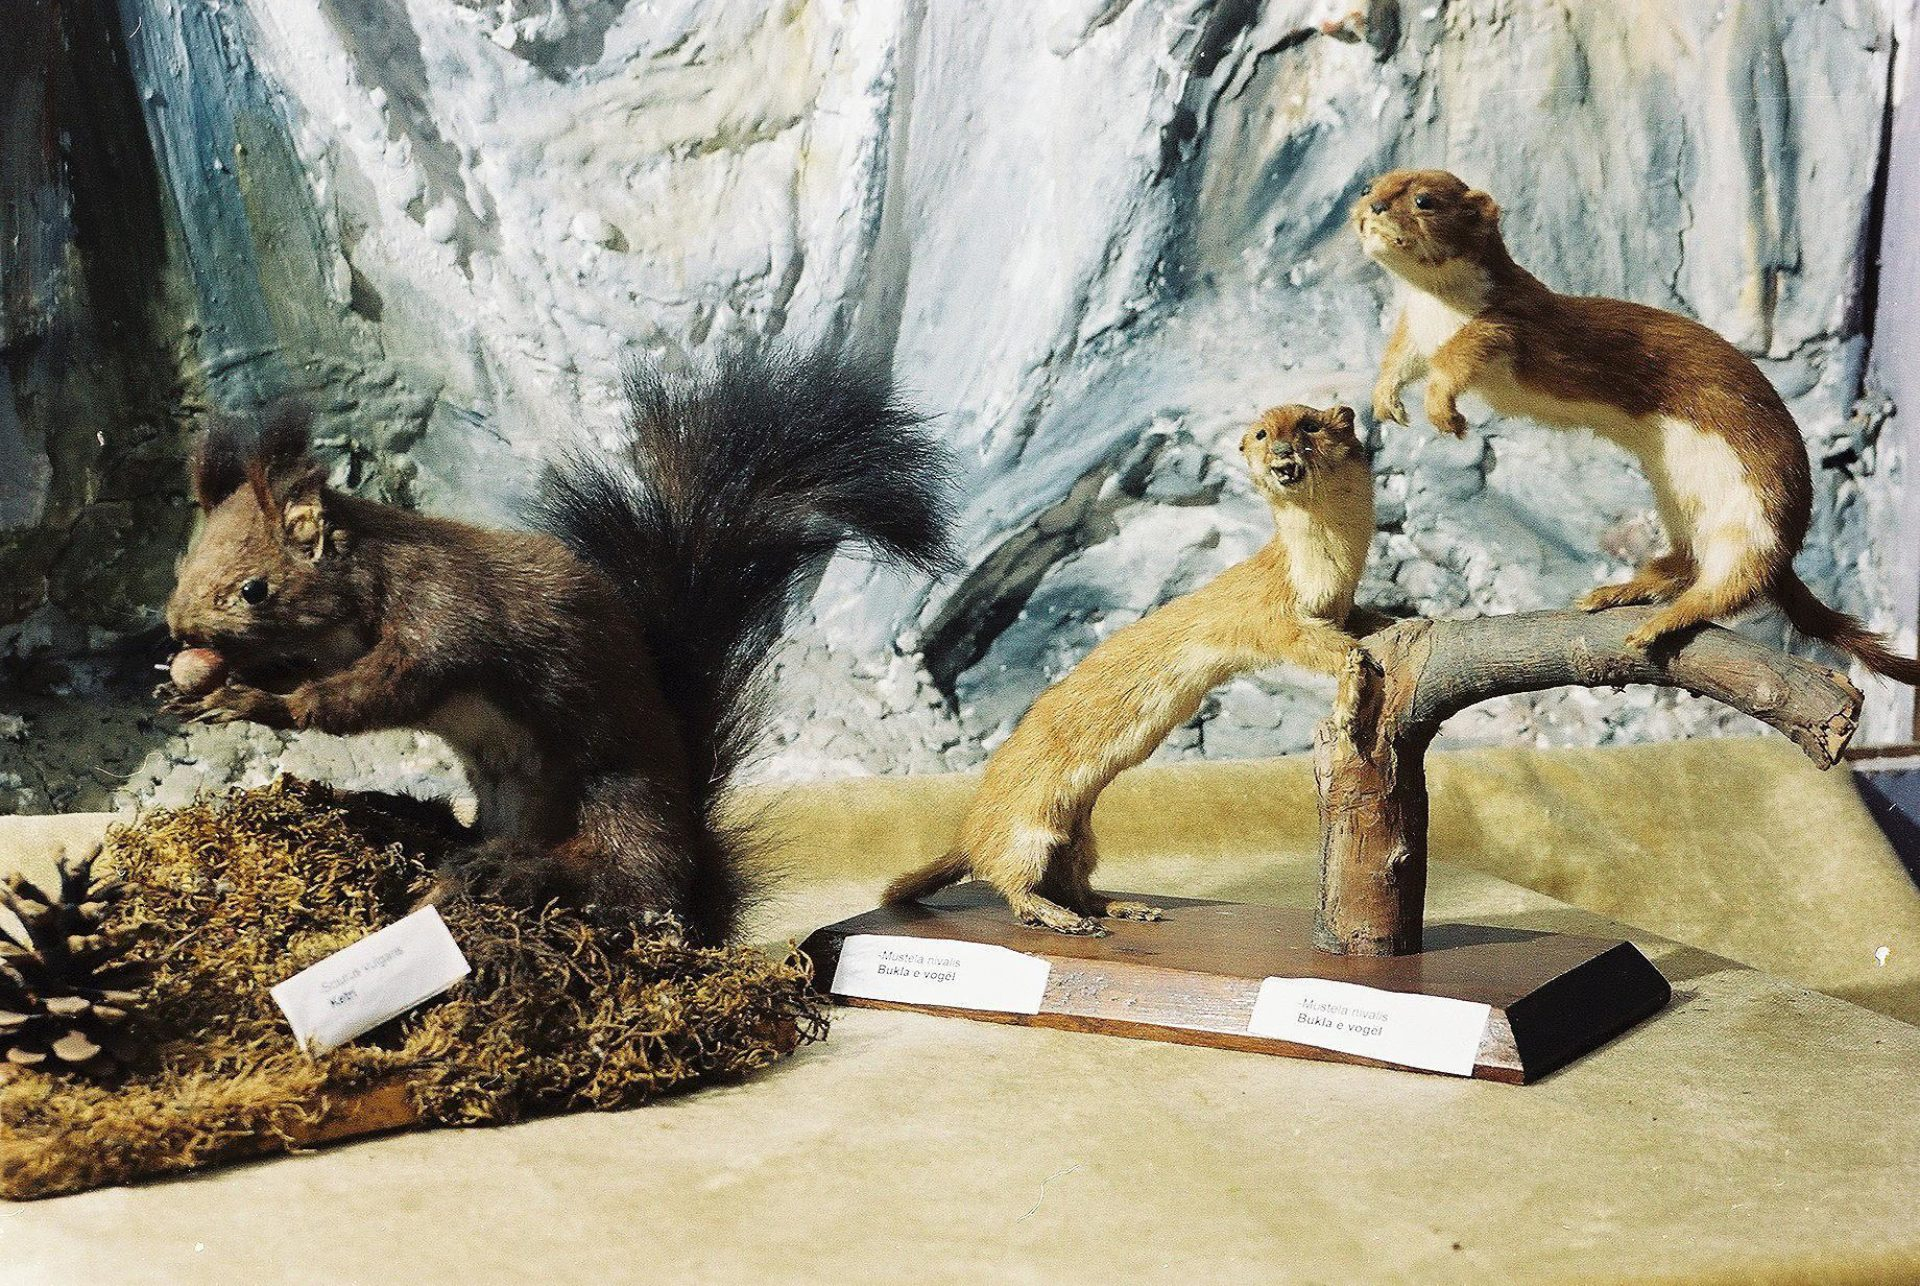 Petrit Halilaj, Special Edition (ex-Natural History Museum of Kosovo), 2013 (39/80)